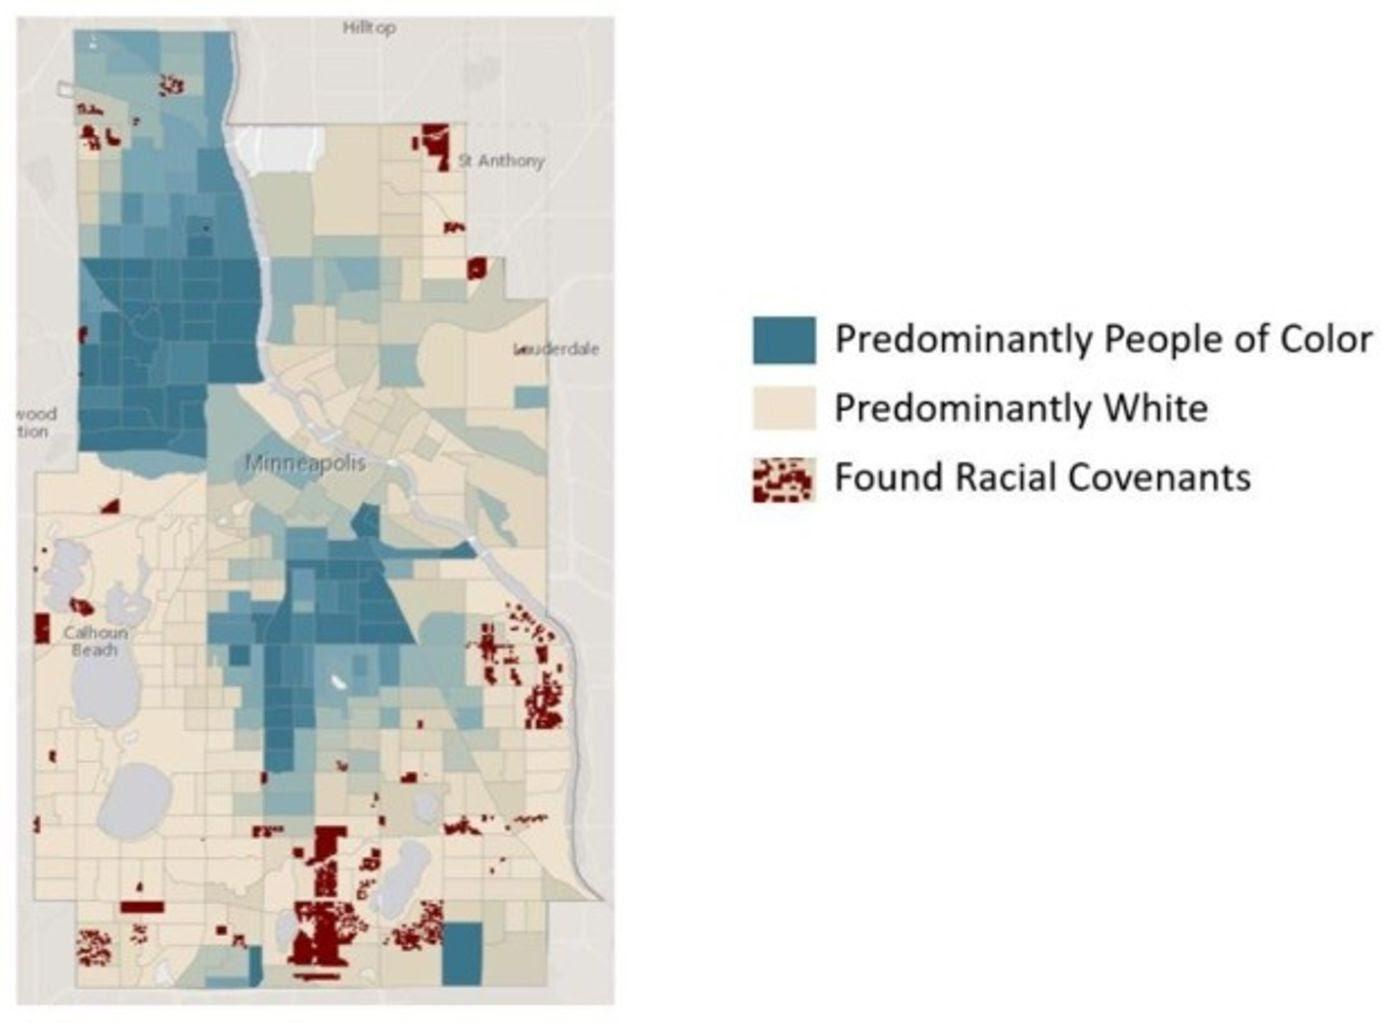 Racial housing covenants